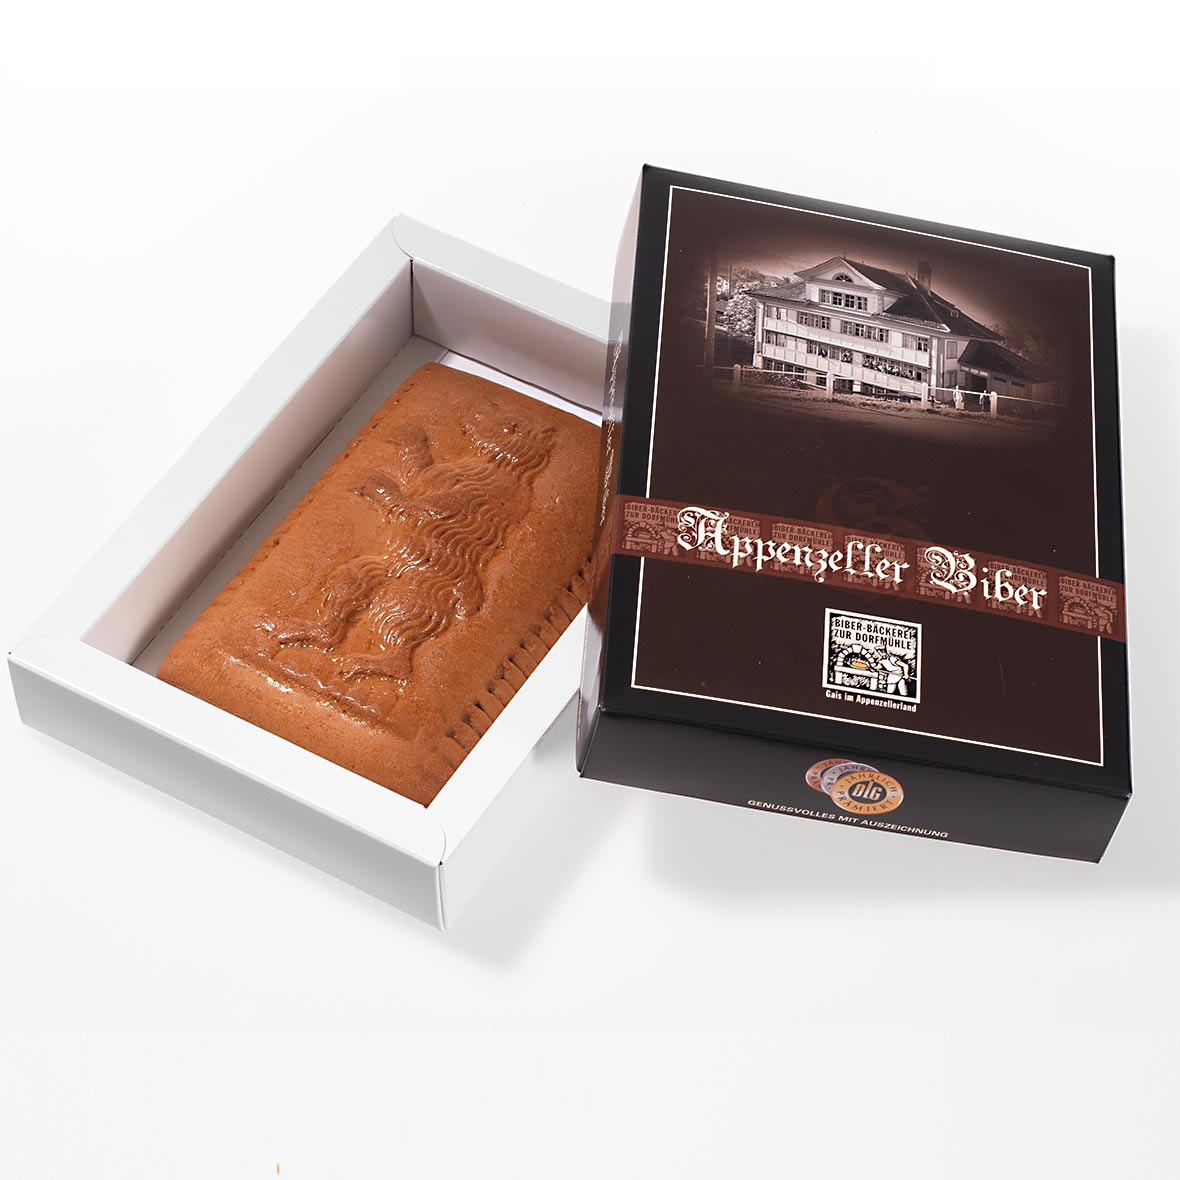 Appenzeller Biber mit Appenzeller Bär 180 g mit Schachtel aus der Biber Bäckerei